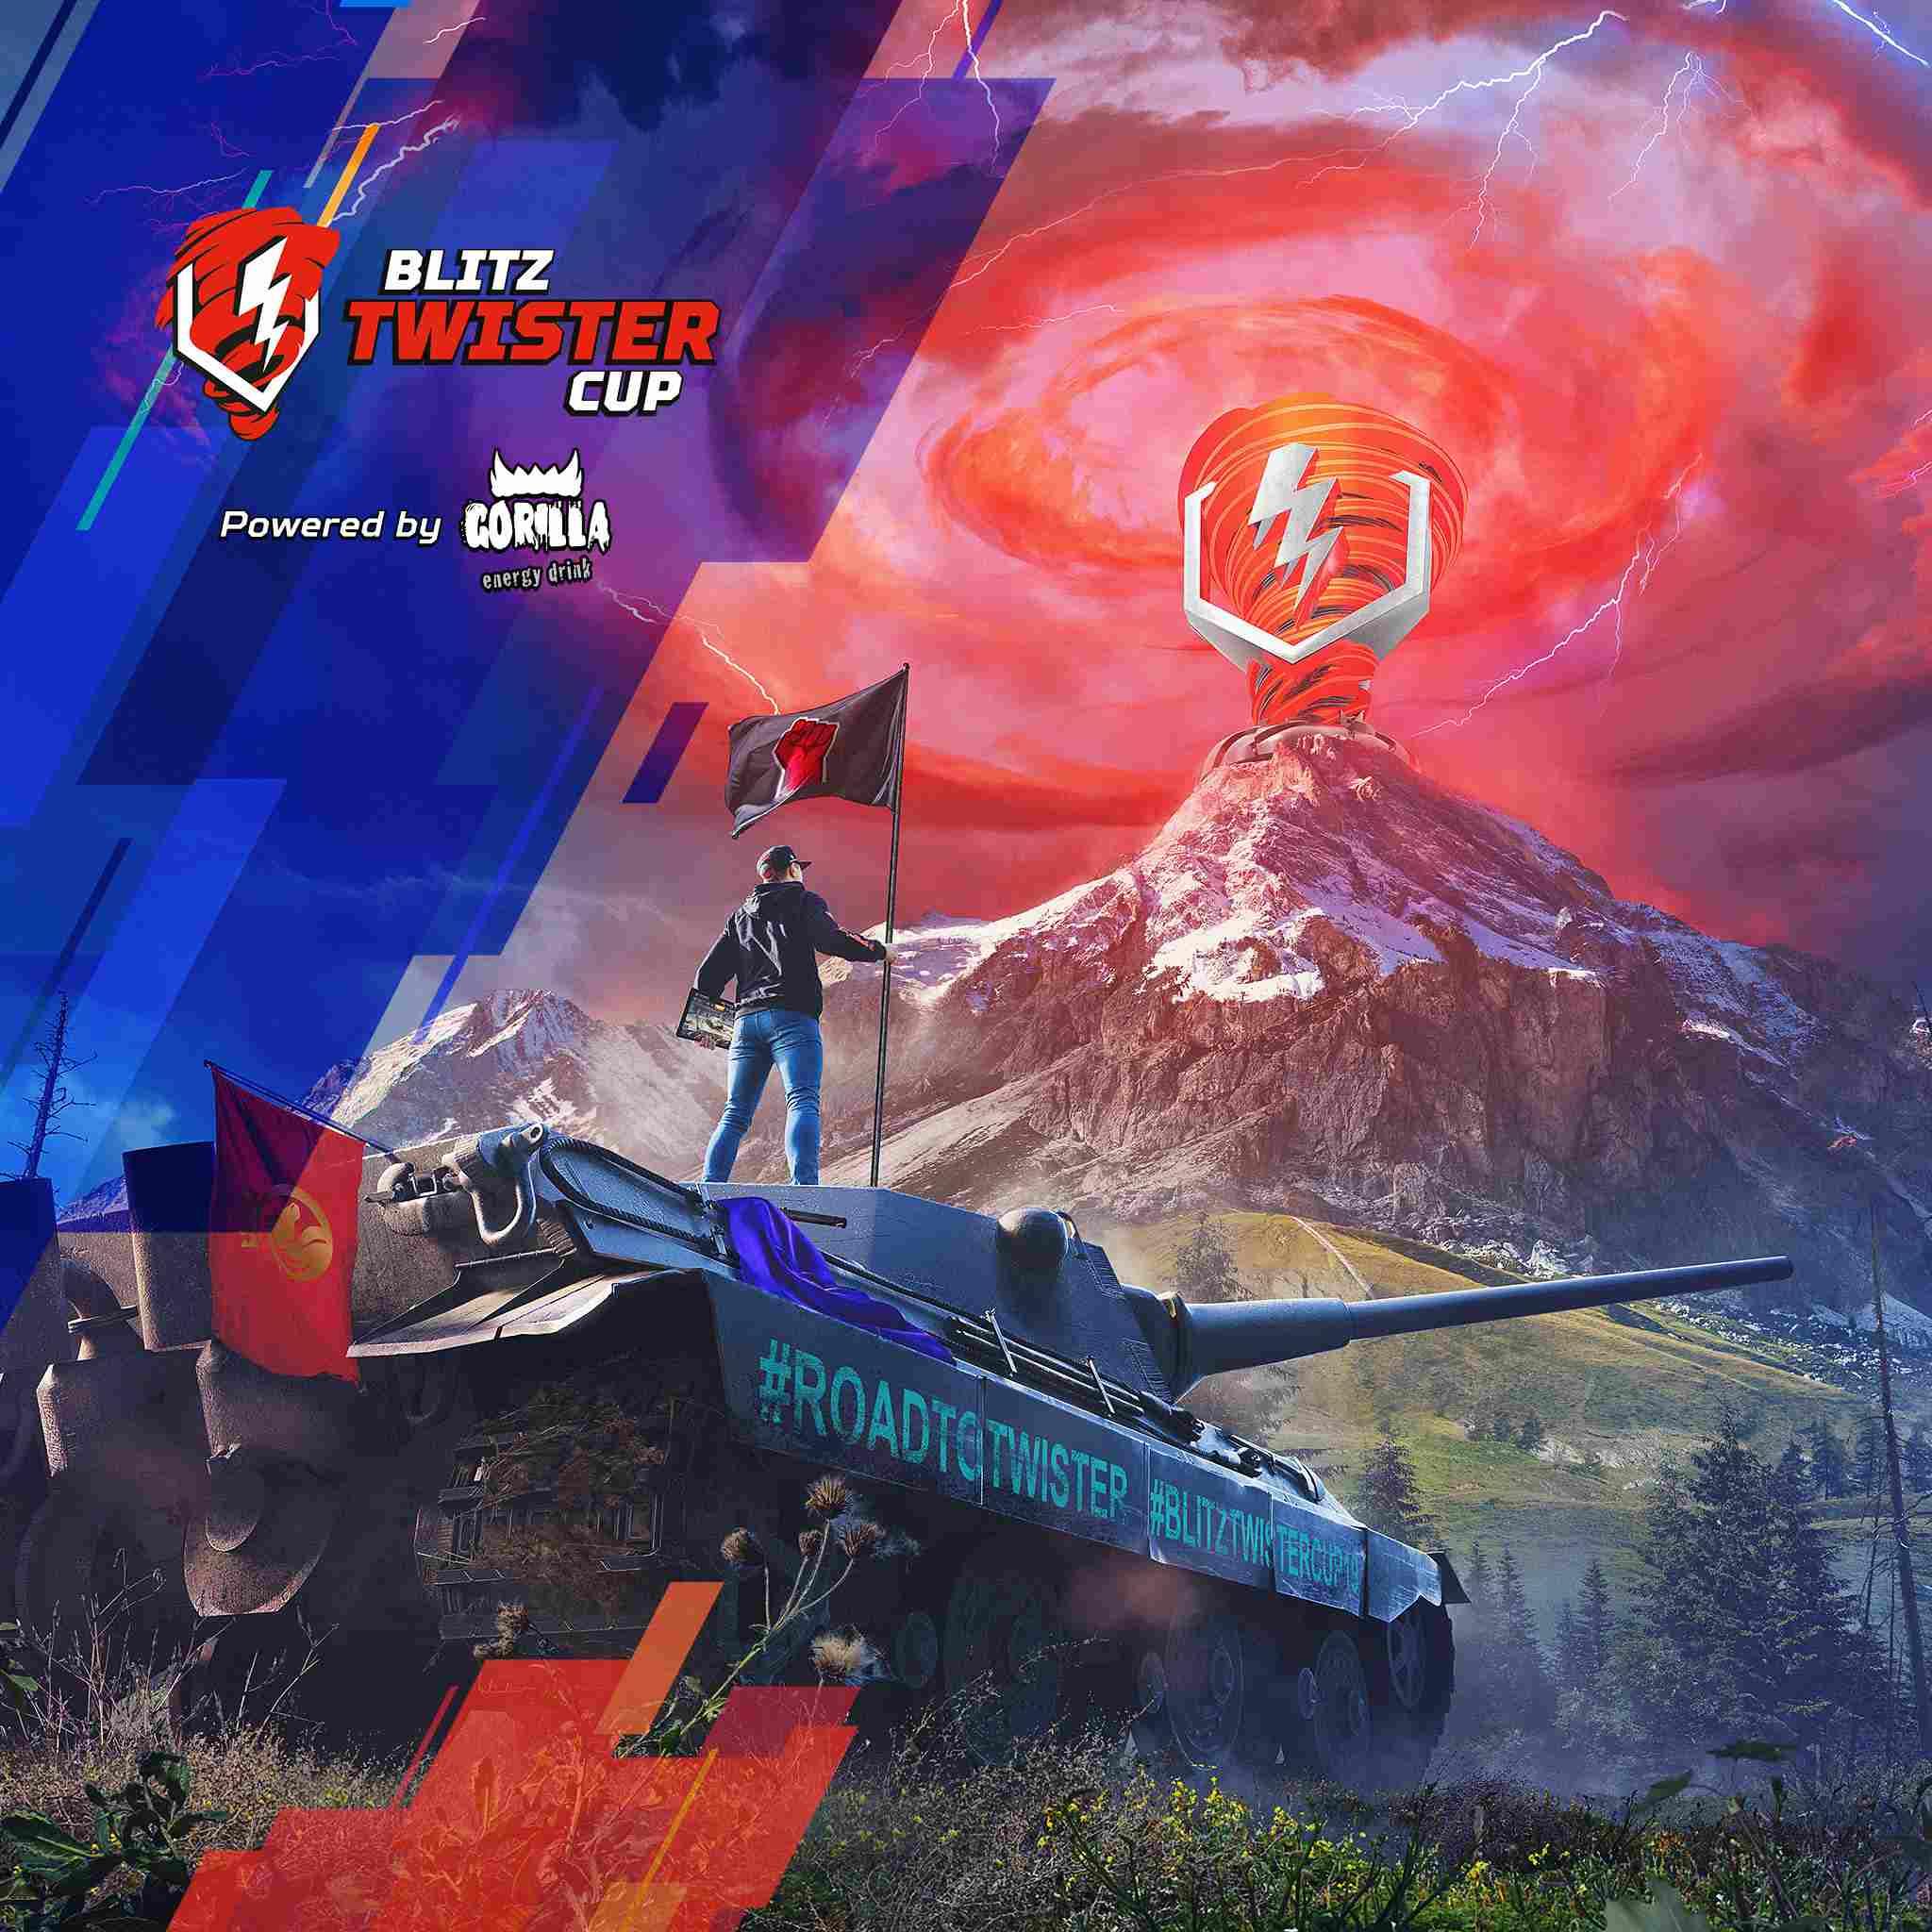 WoTBlitz Twister Cup 2019 Artwork Mail